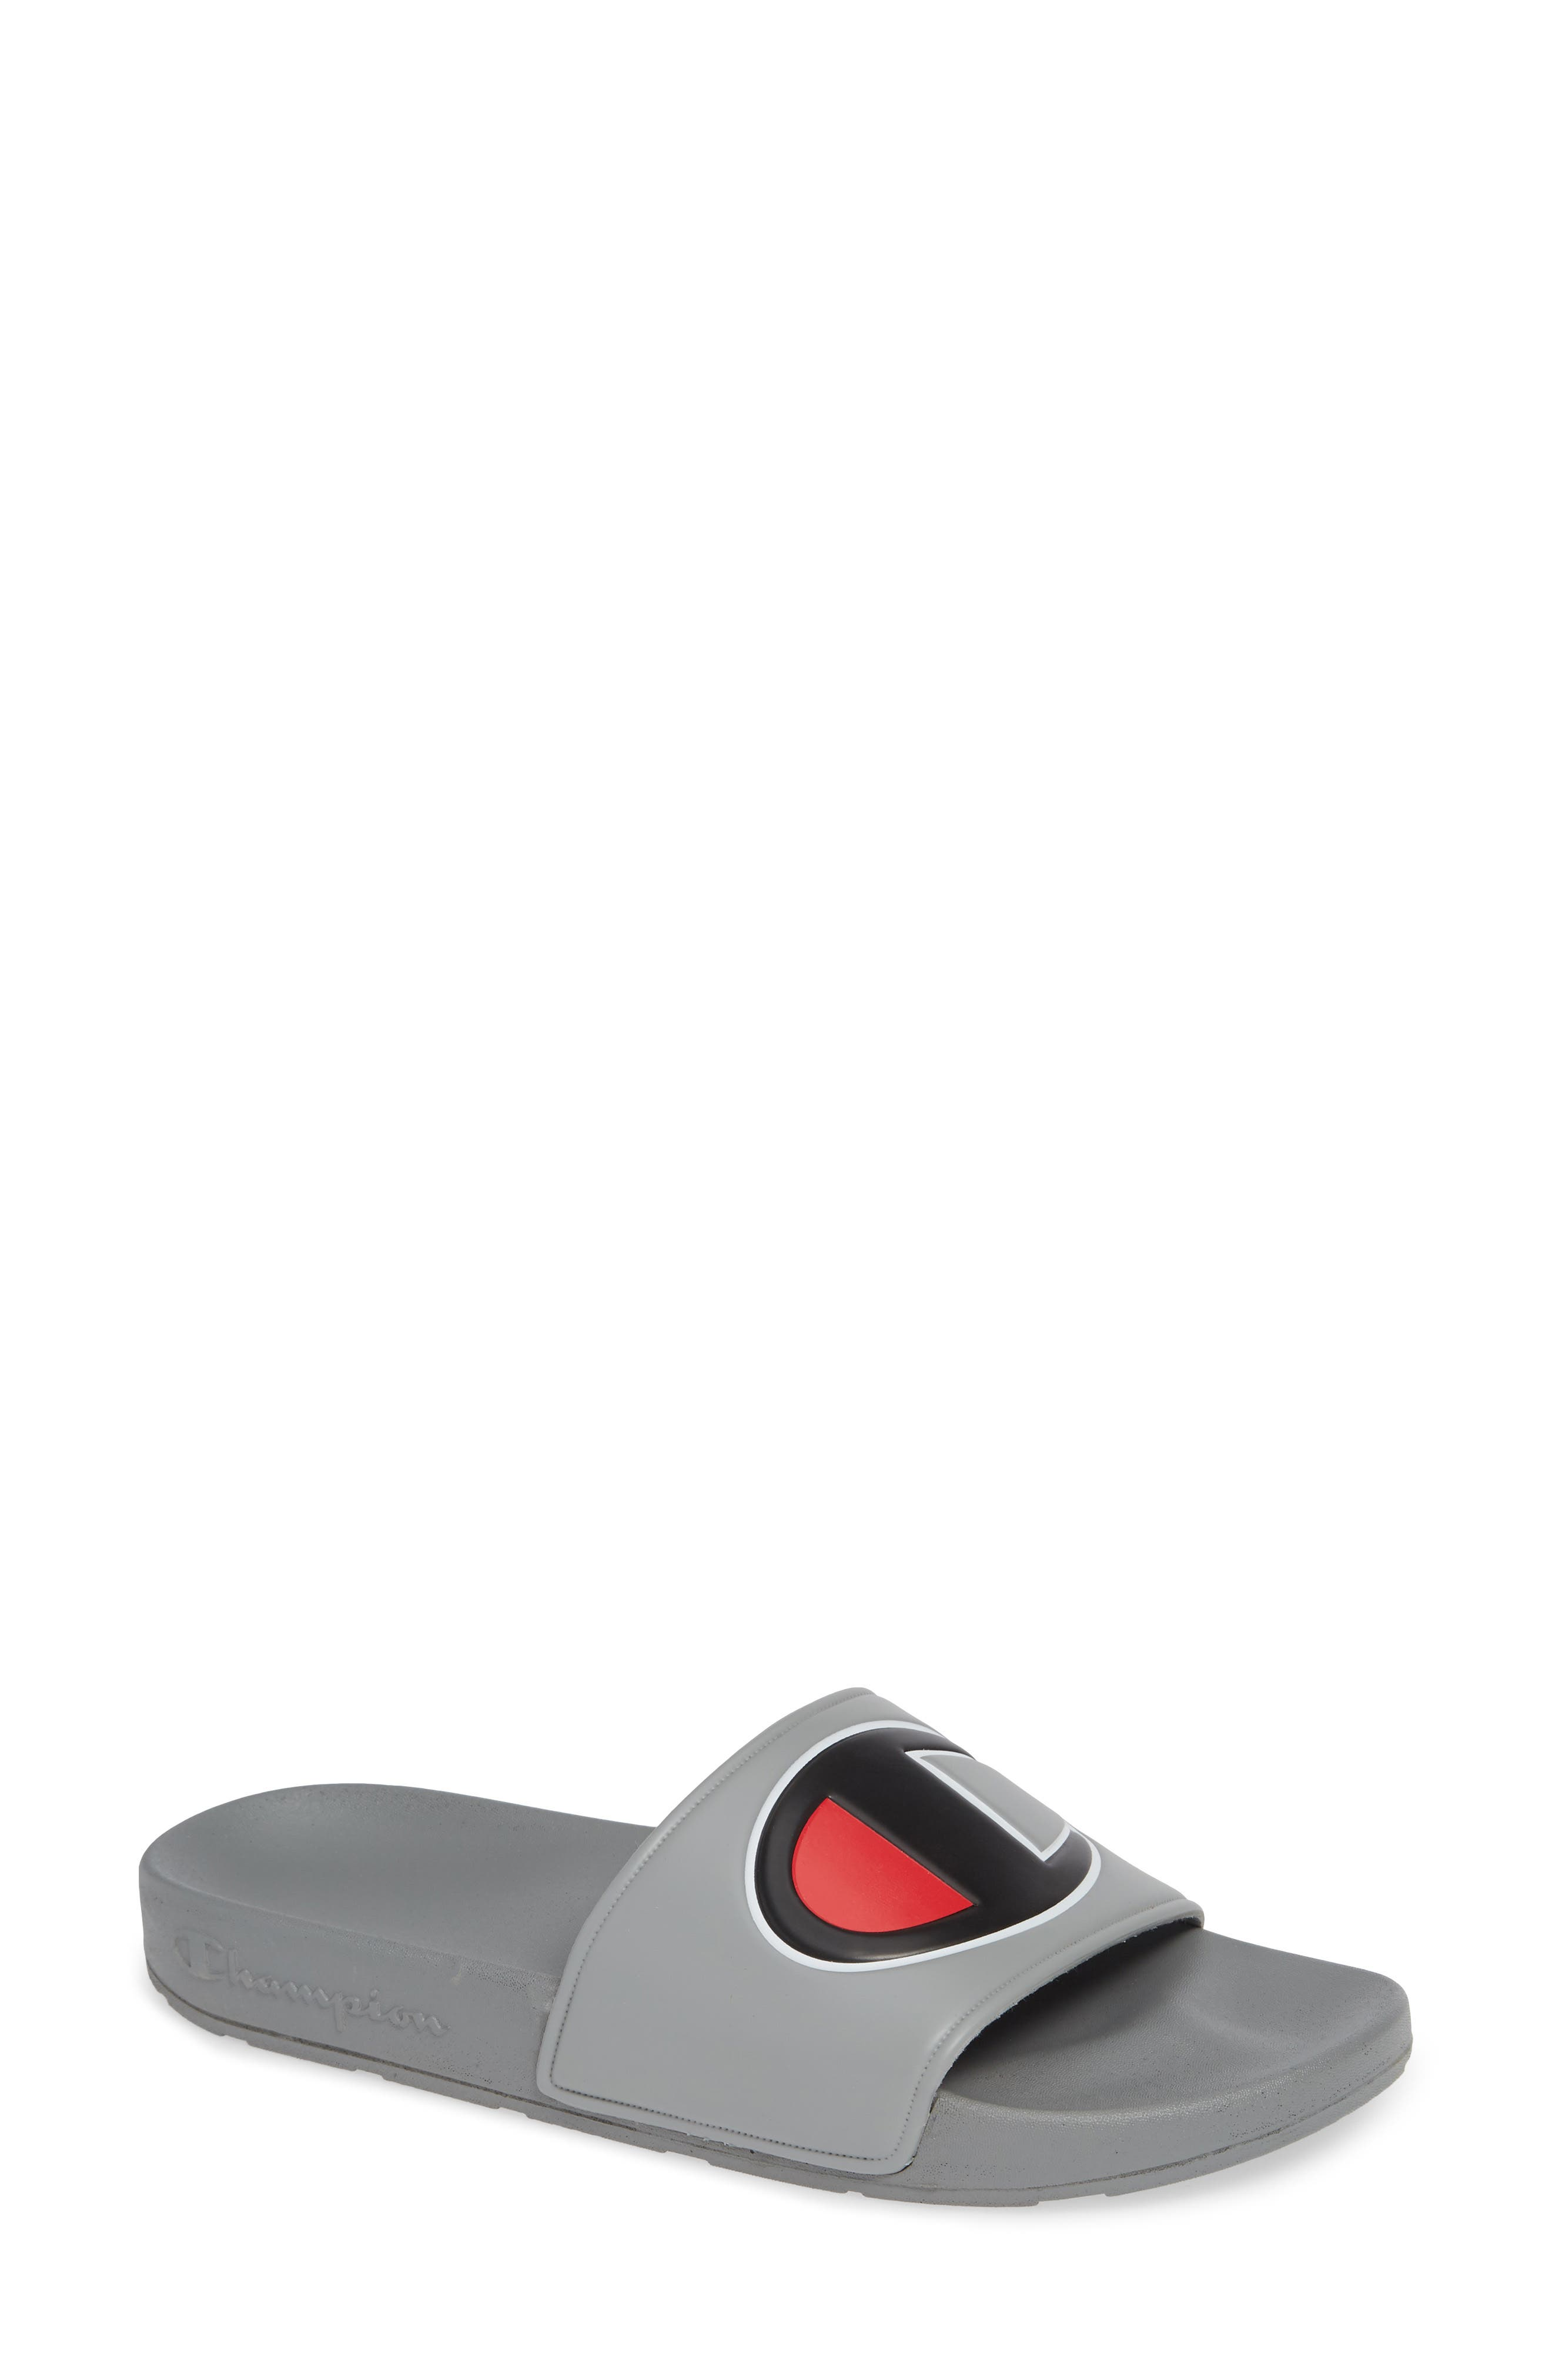 Slide Sandal,                         Main,                         color, 020